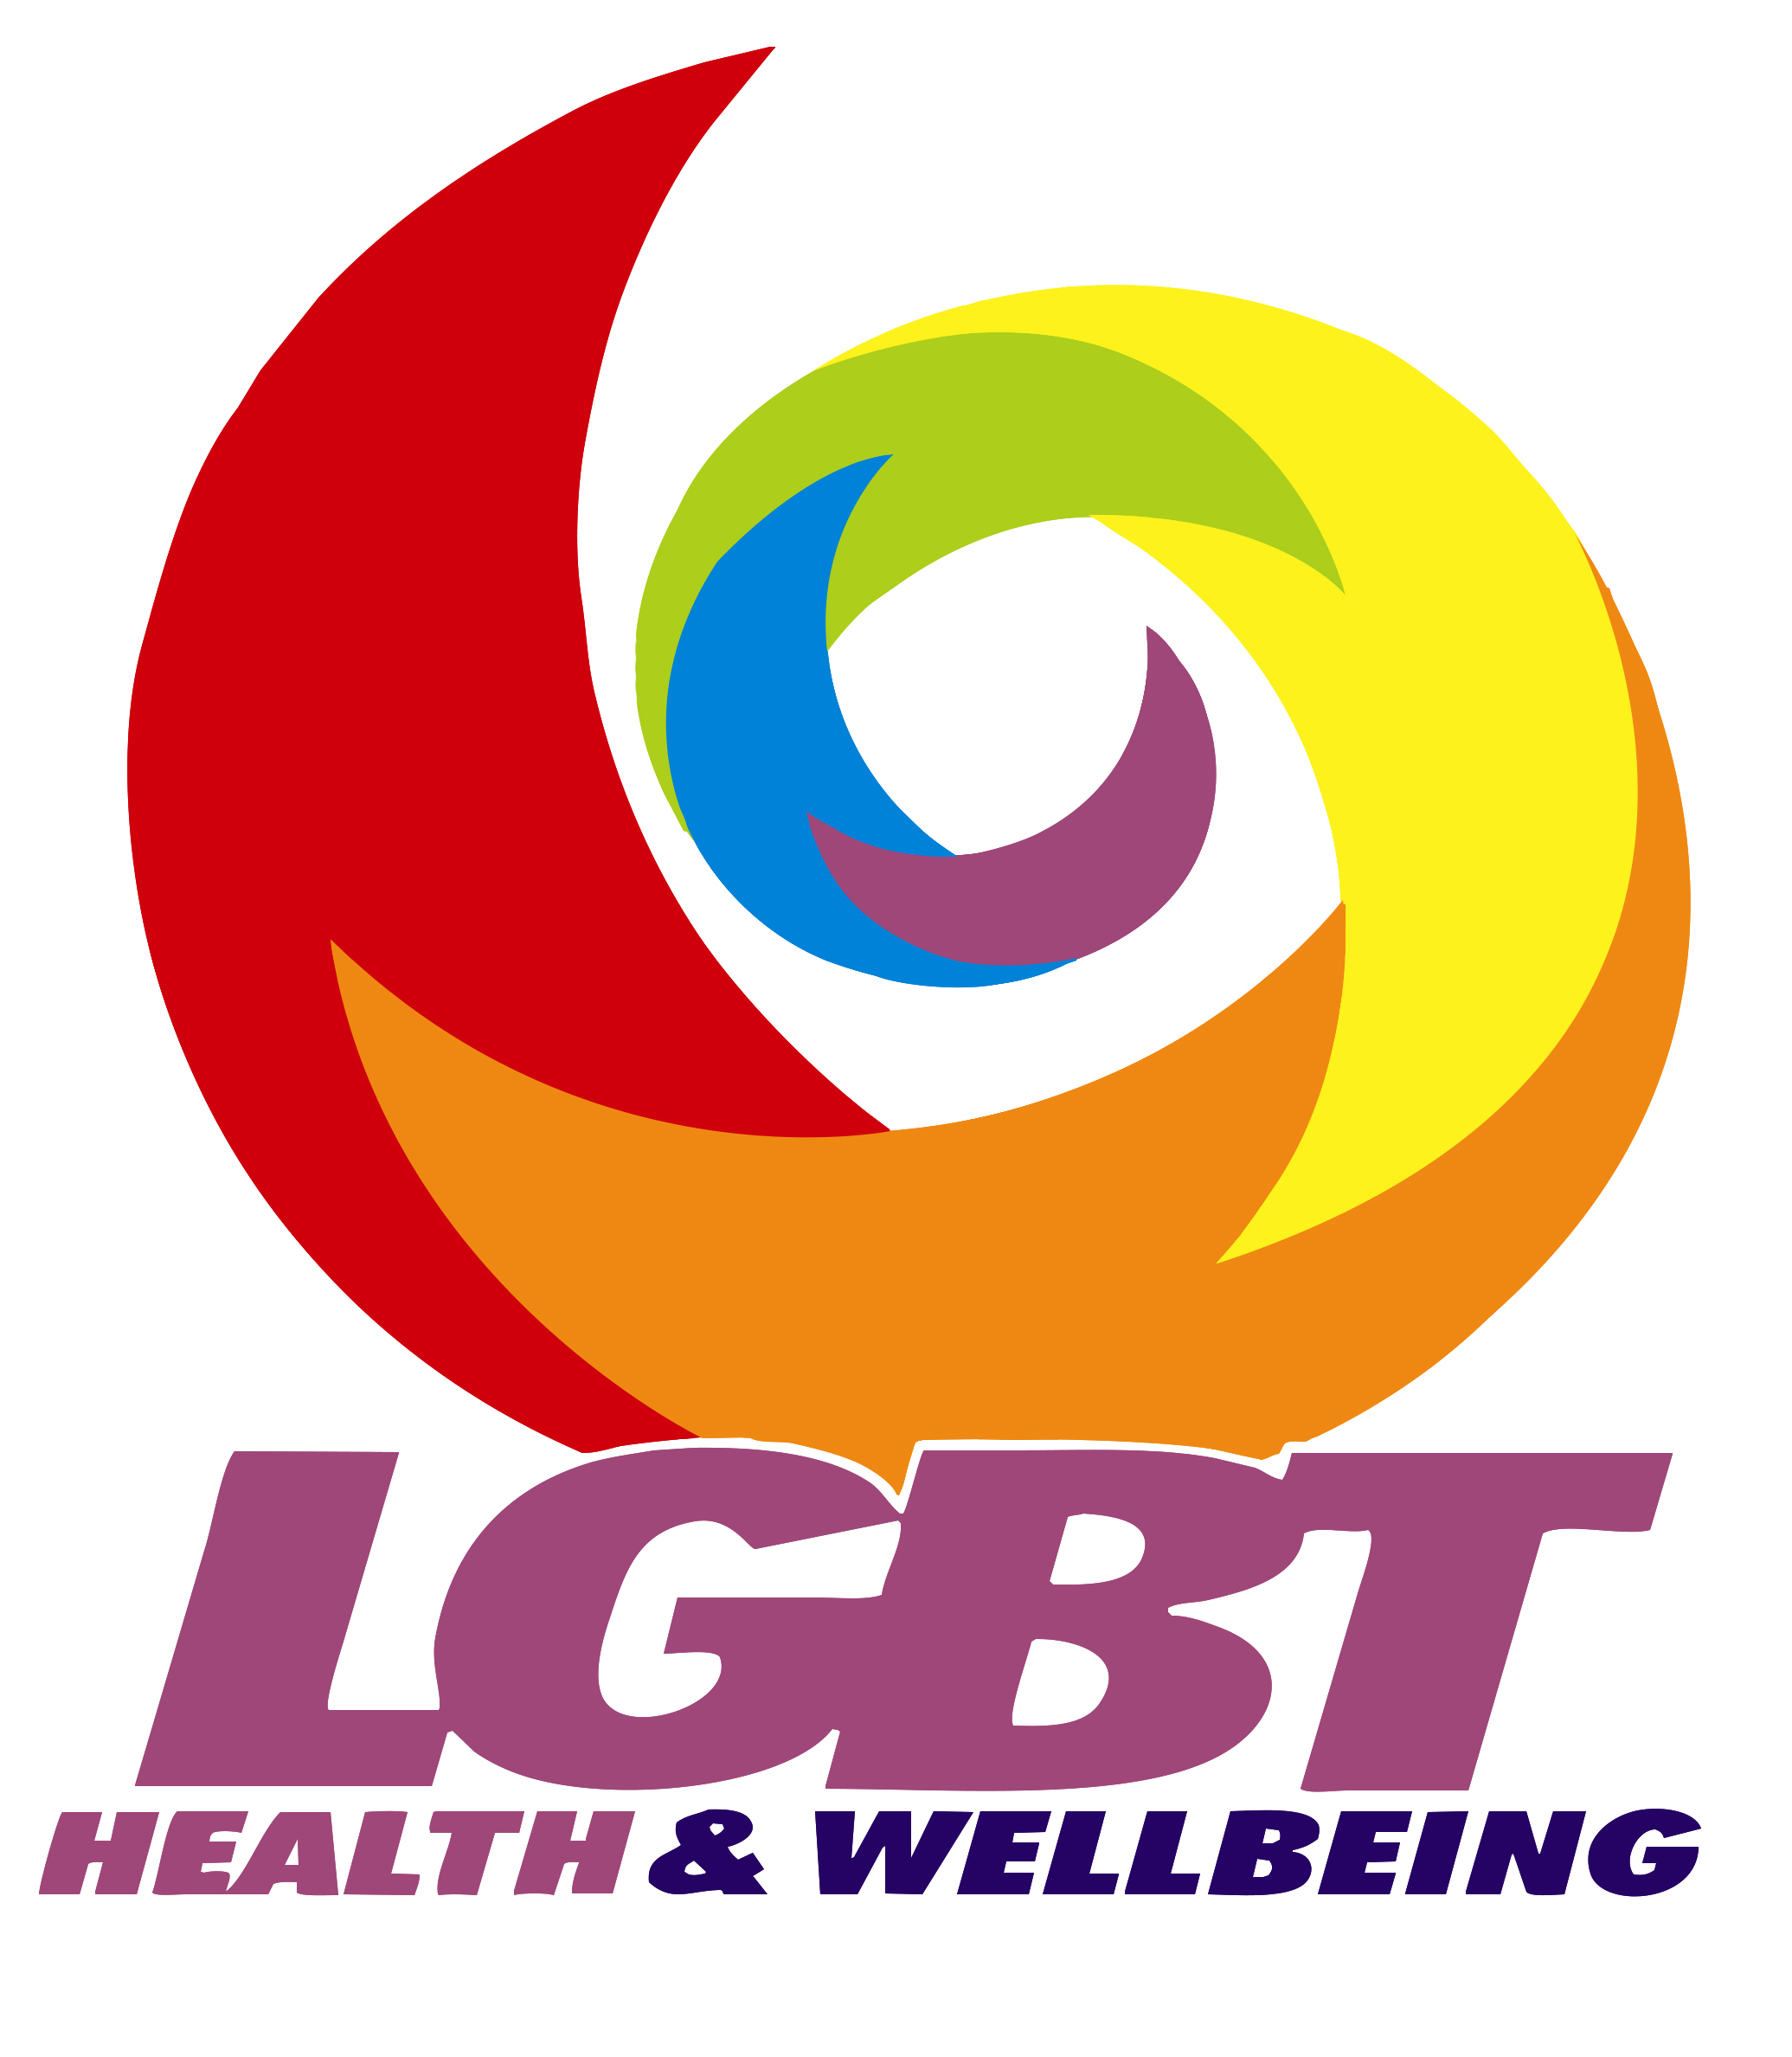 LGBTHW logo